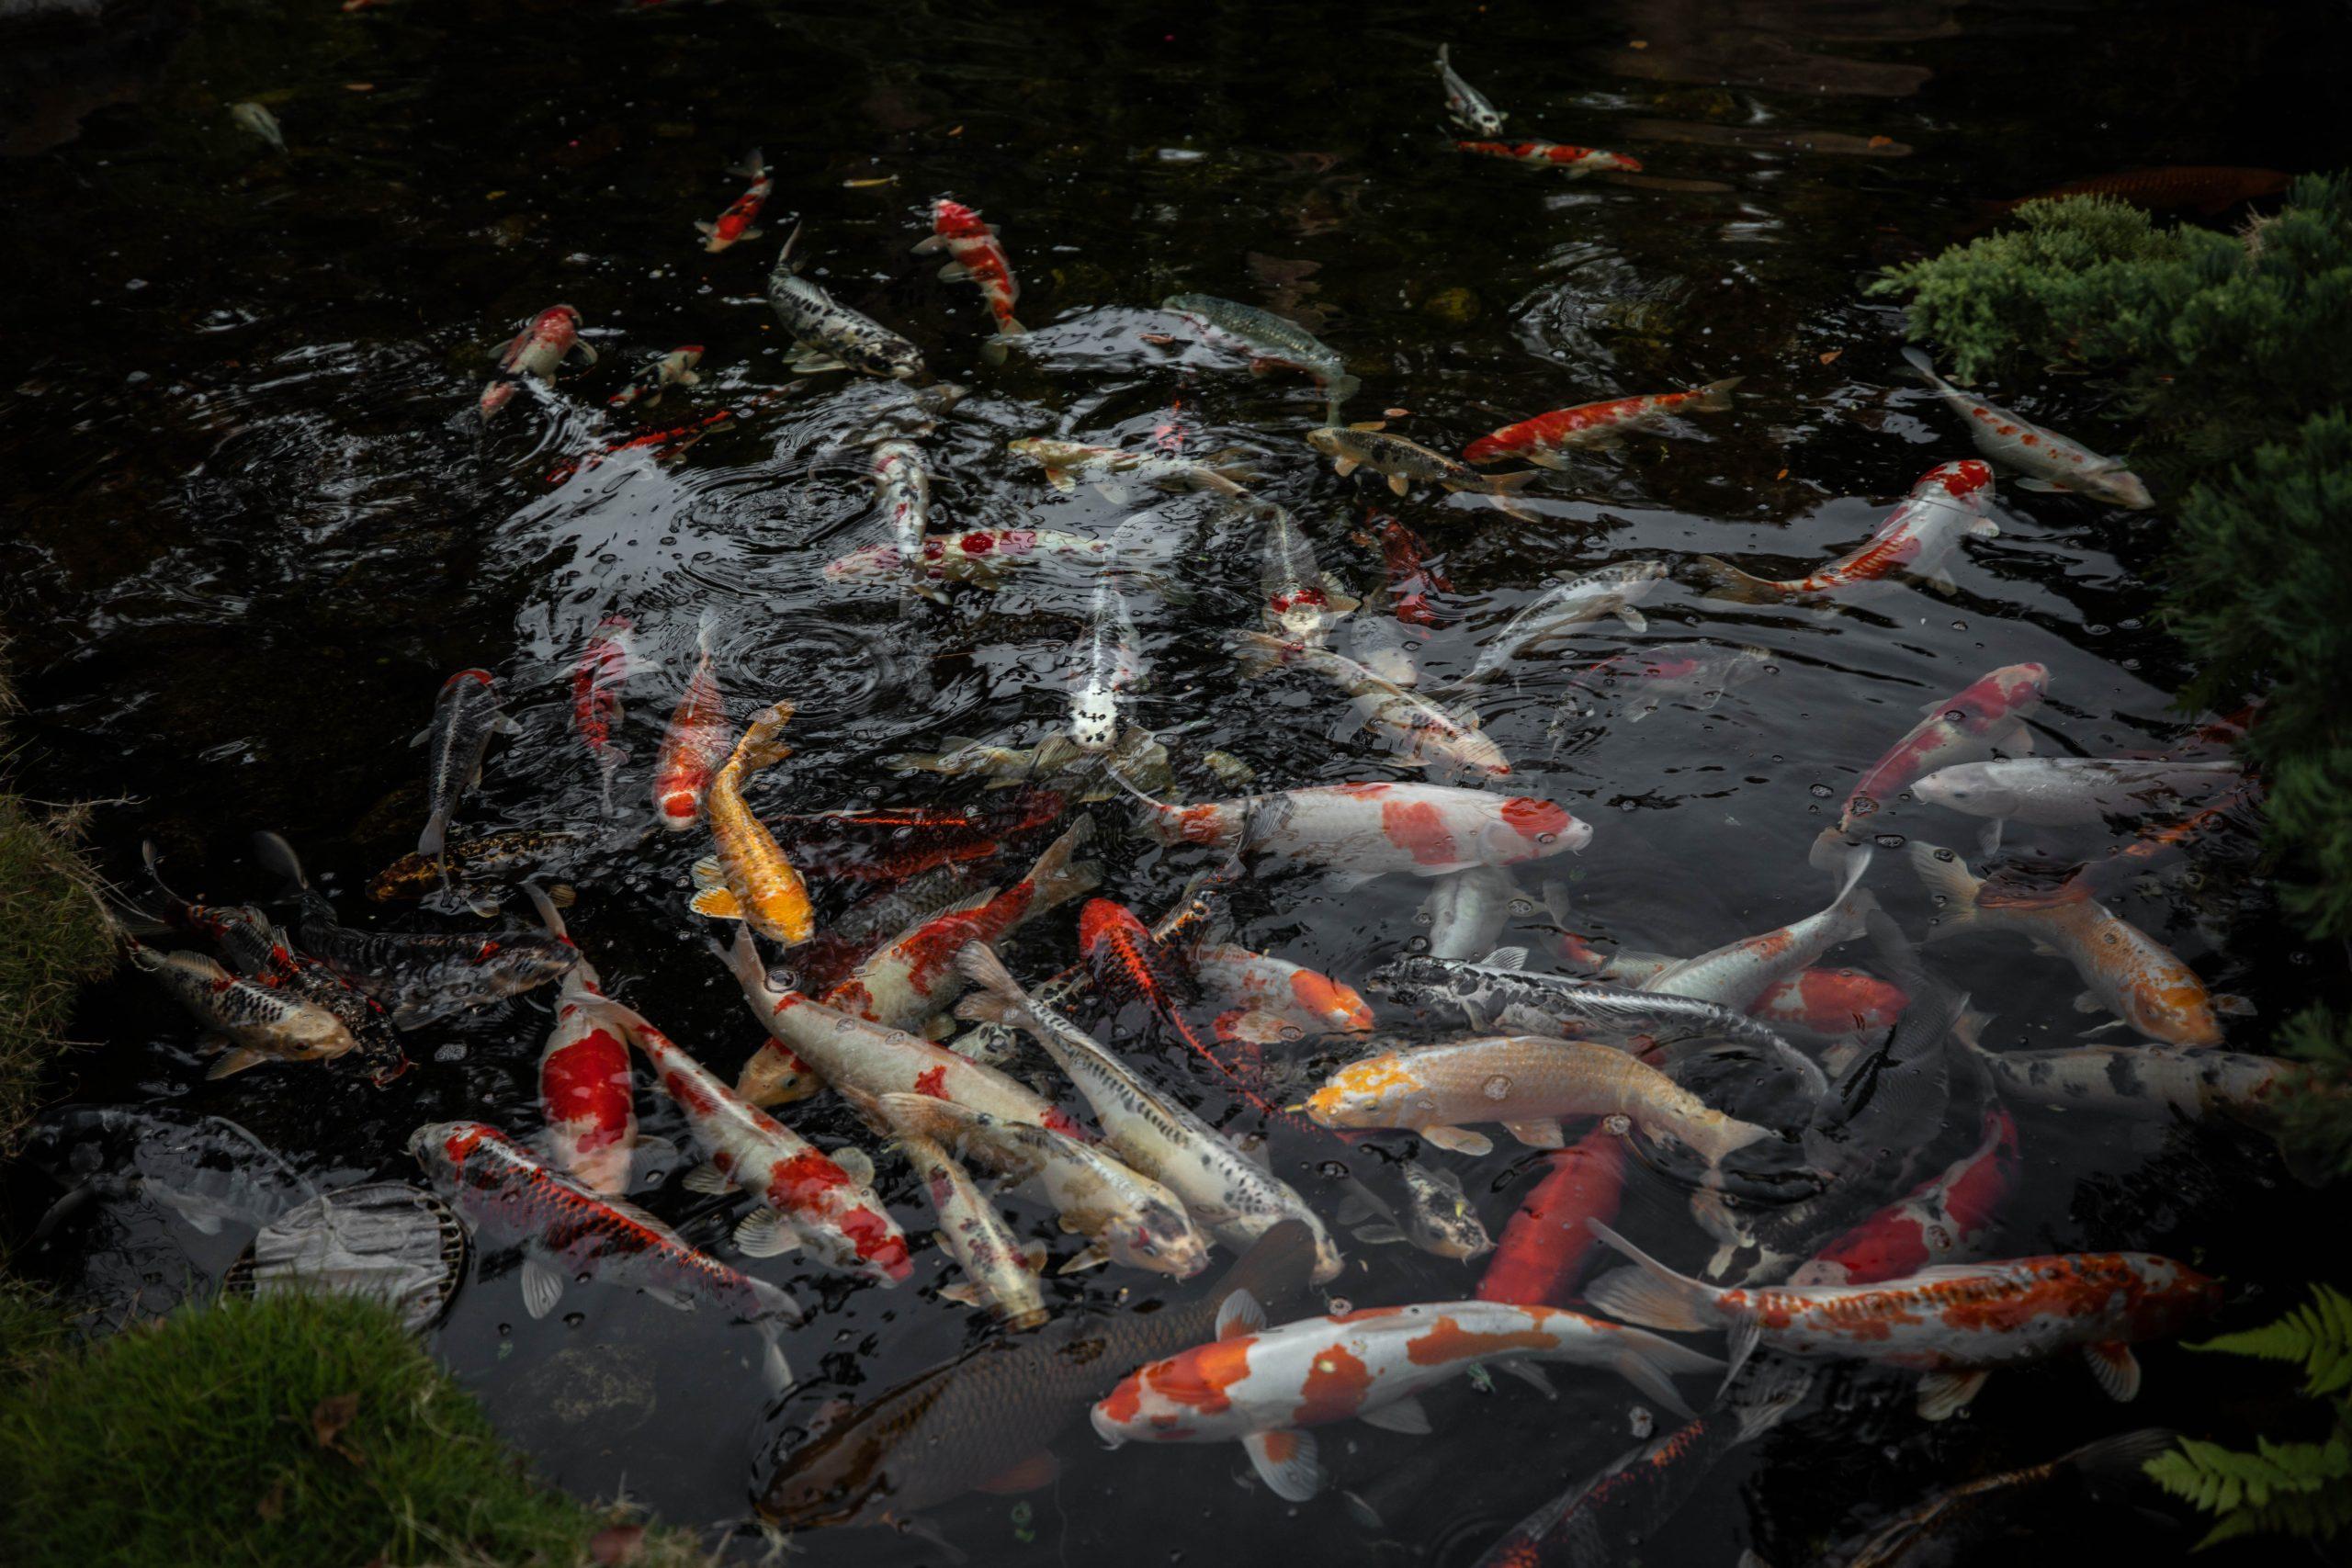 Koi Pond Japan Epcot Walt Disney World by Luxury Travel Writer and Photographer Annie Fairfax